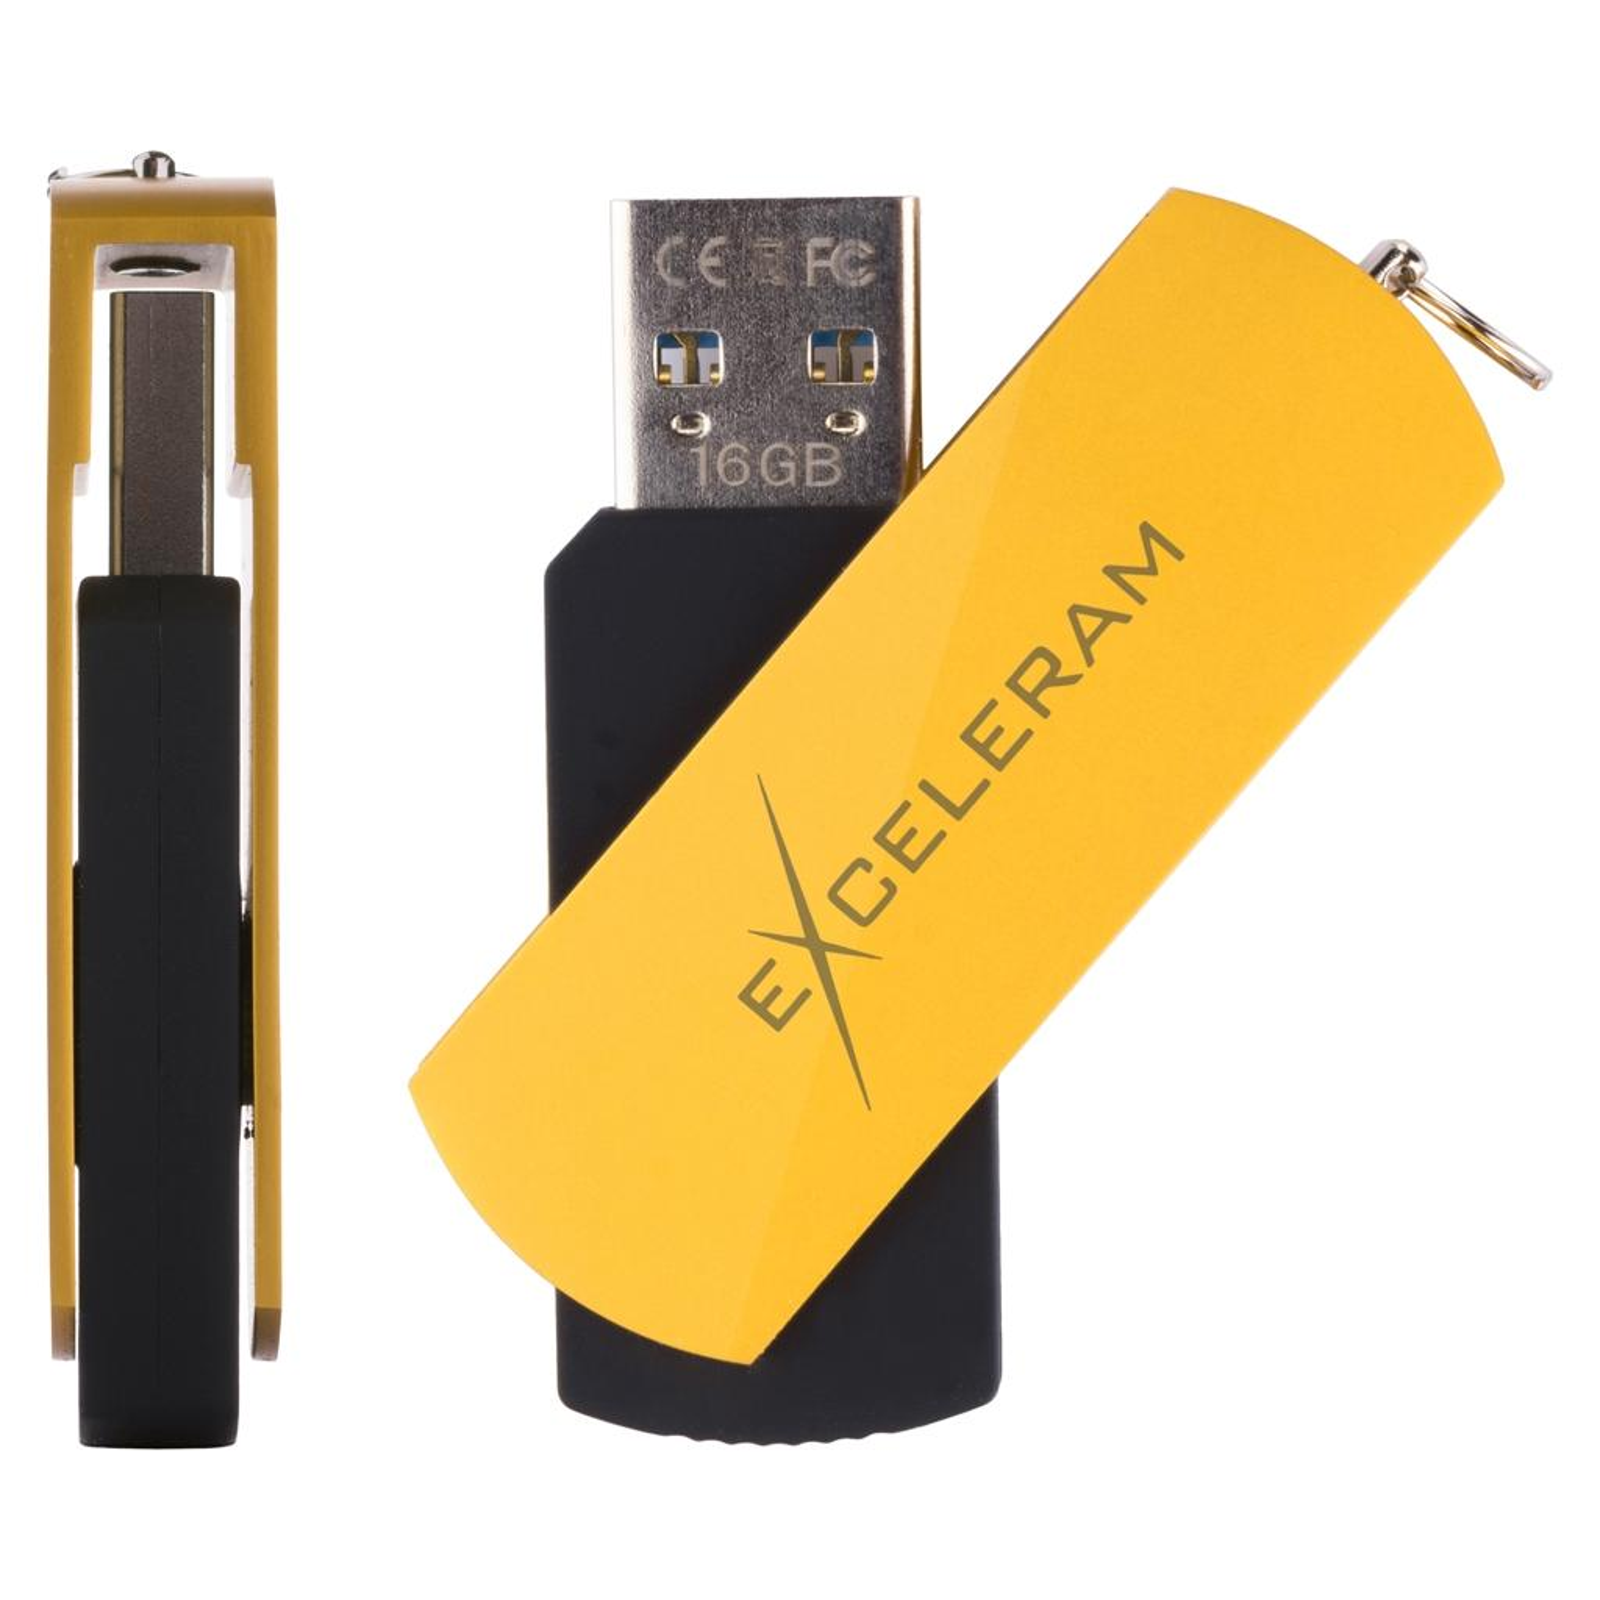 USB флеш накопитель eXceleram 16GB P2 Series Black/Black USB 3.1 Gen 1 (EXP2U3BB16) изображение 4